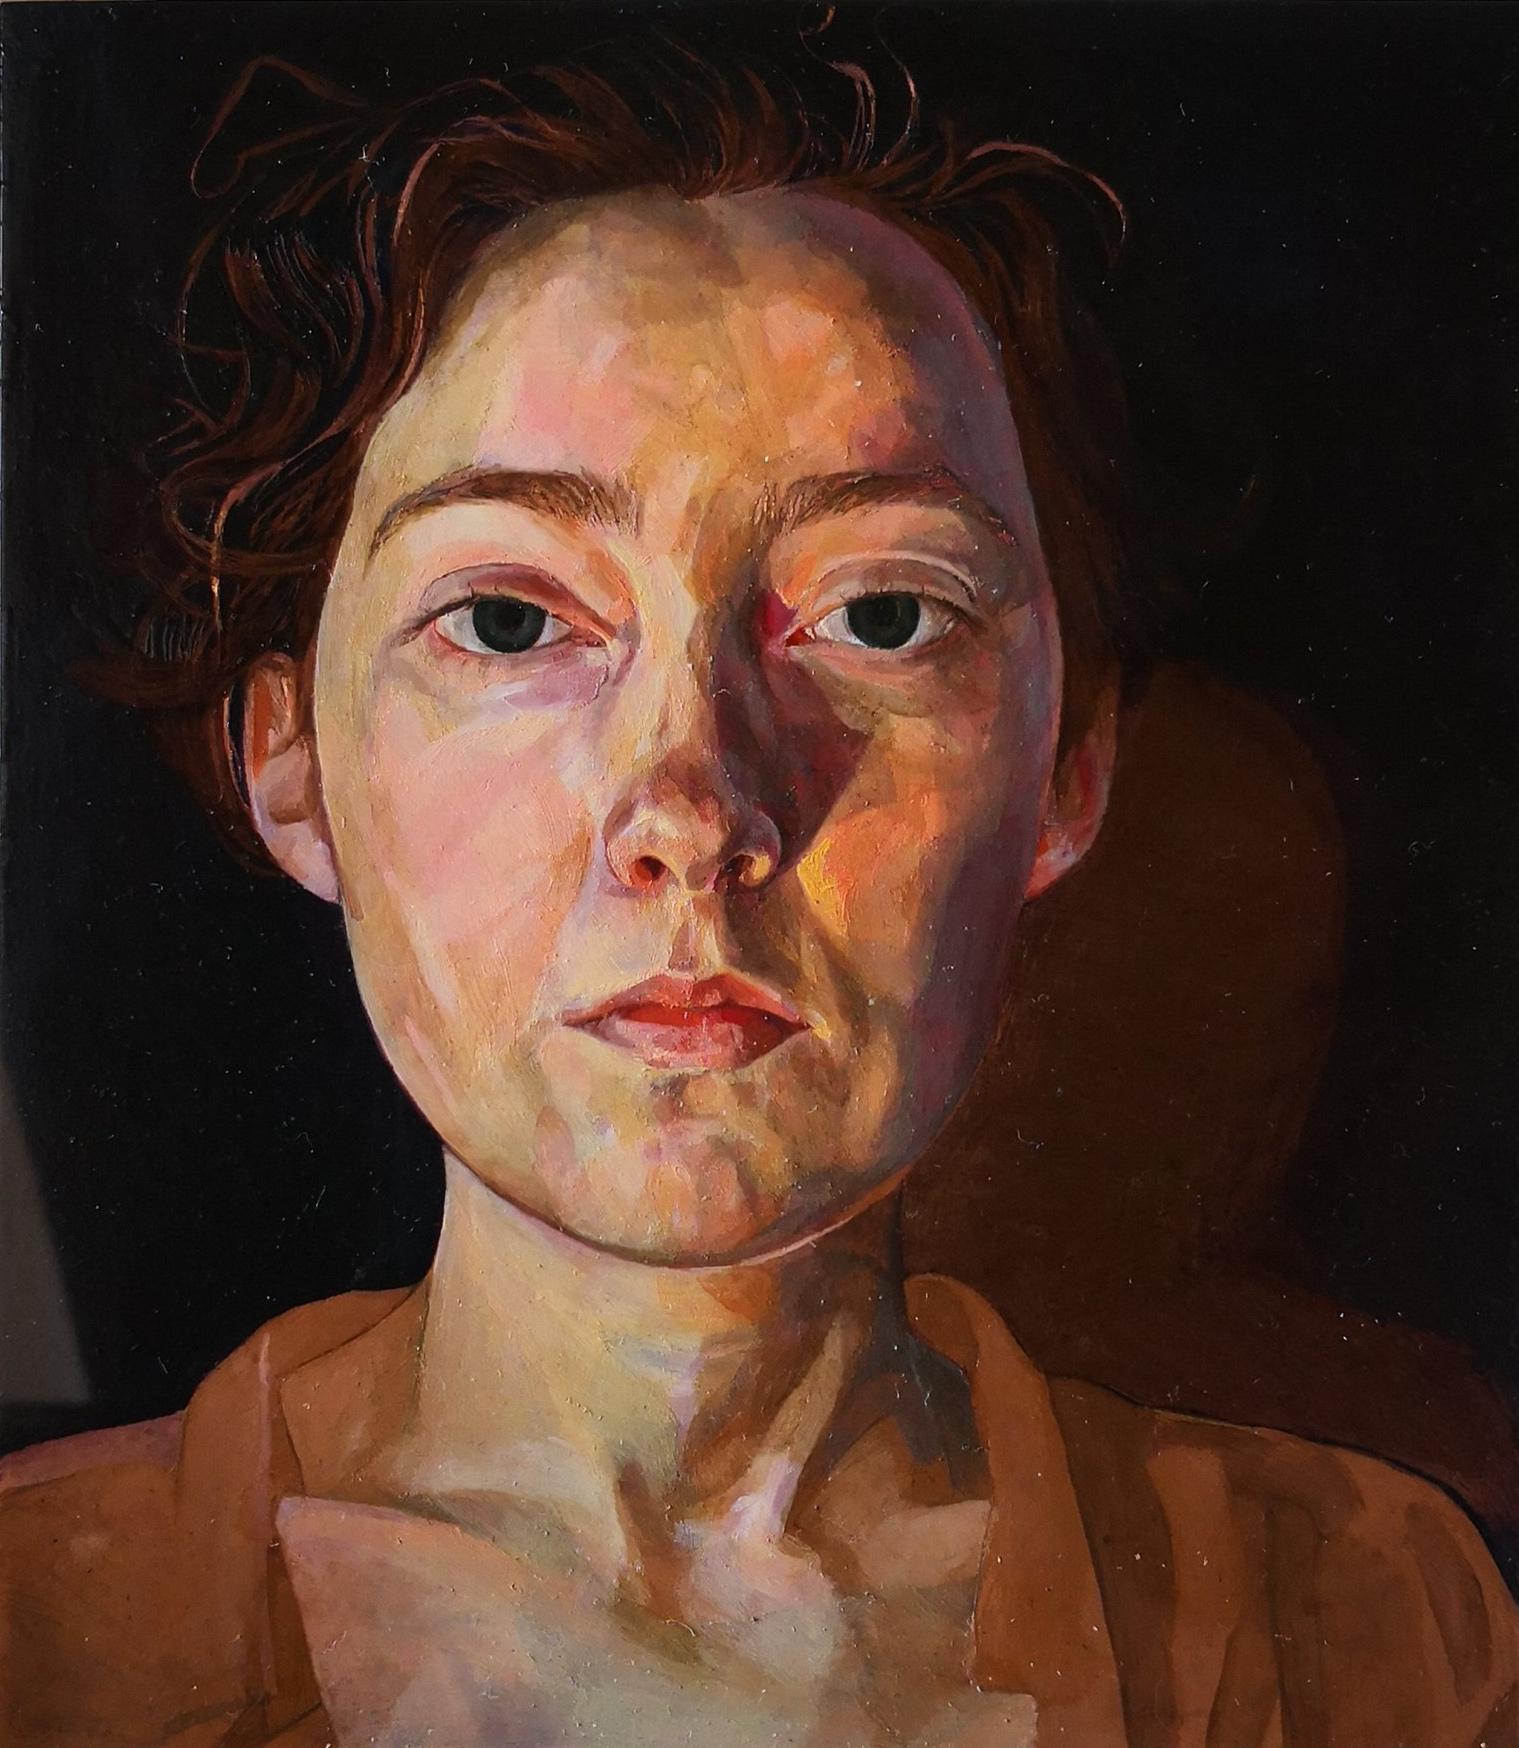 'A minute till midnight' (2017) Oil on copper, 25 x 22.5 cm